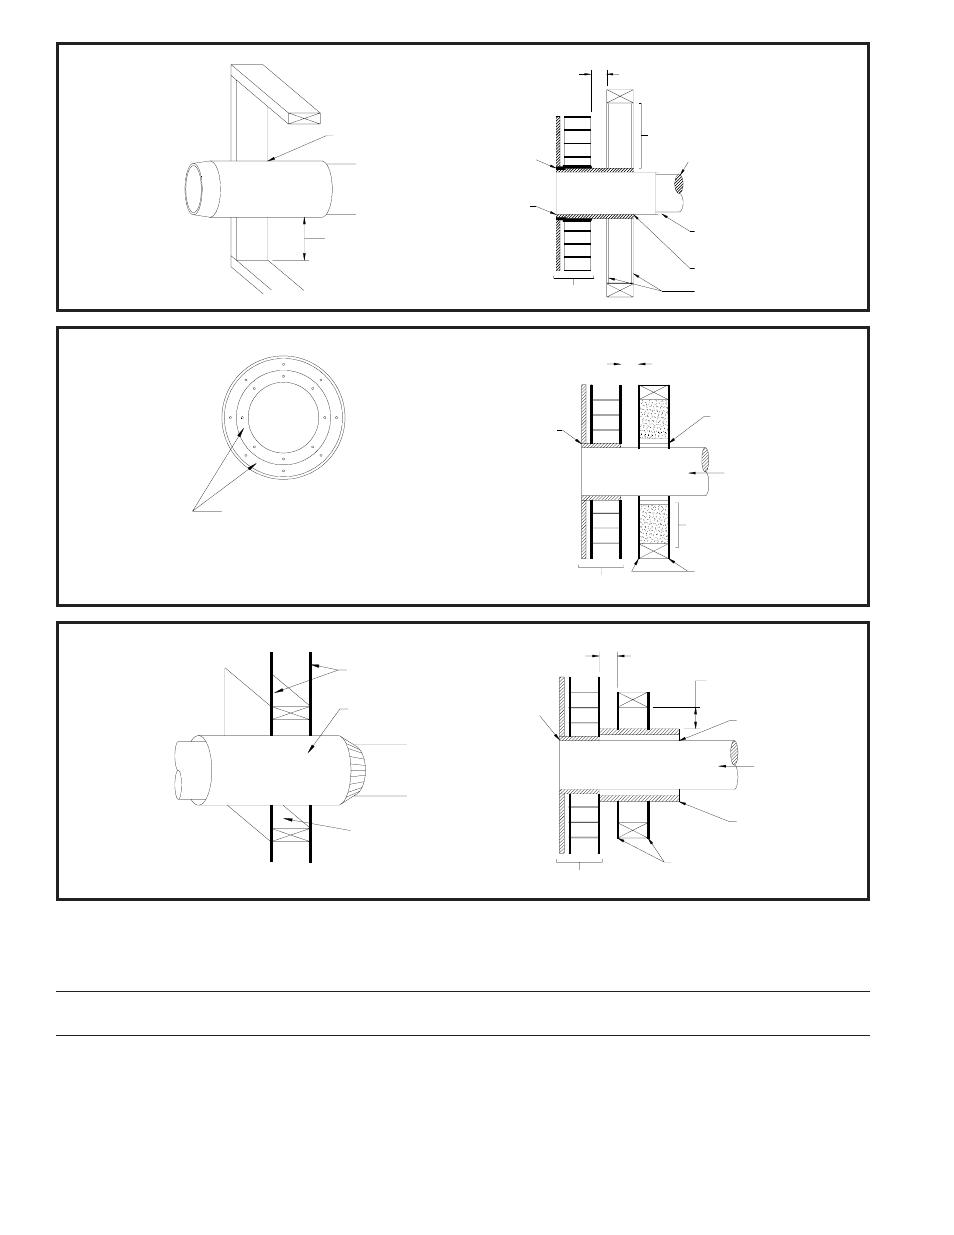 United States Stove Company LOGWOOD 2421 User Manual | Page 8 / 12